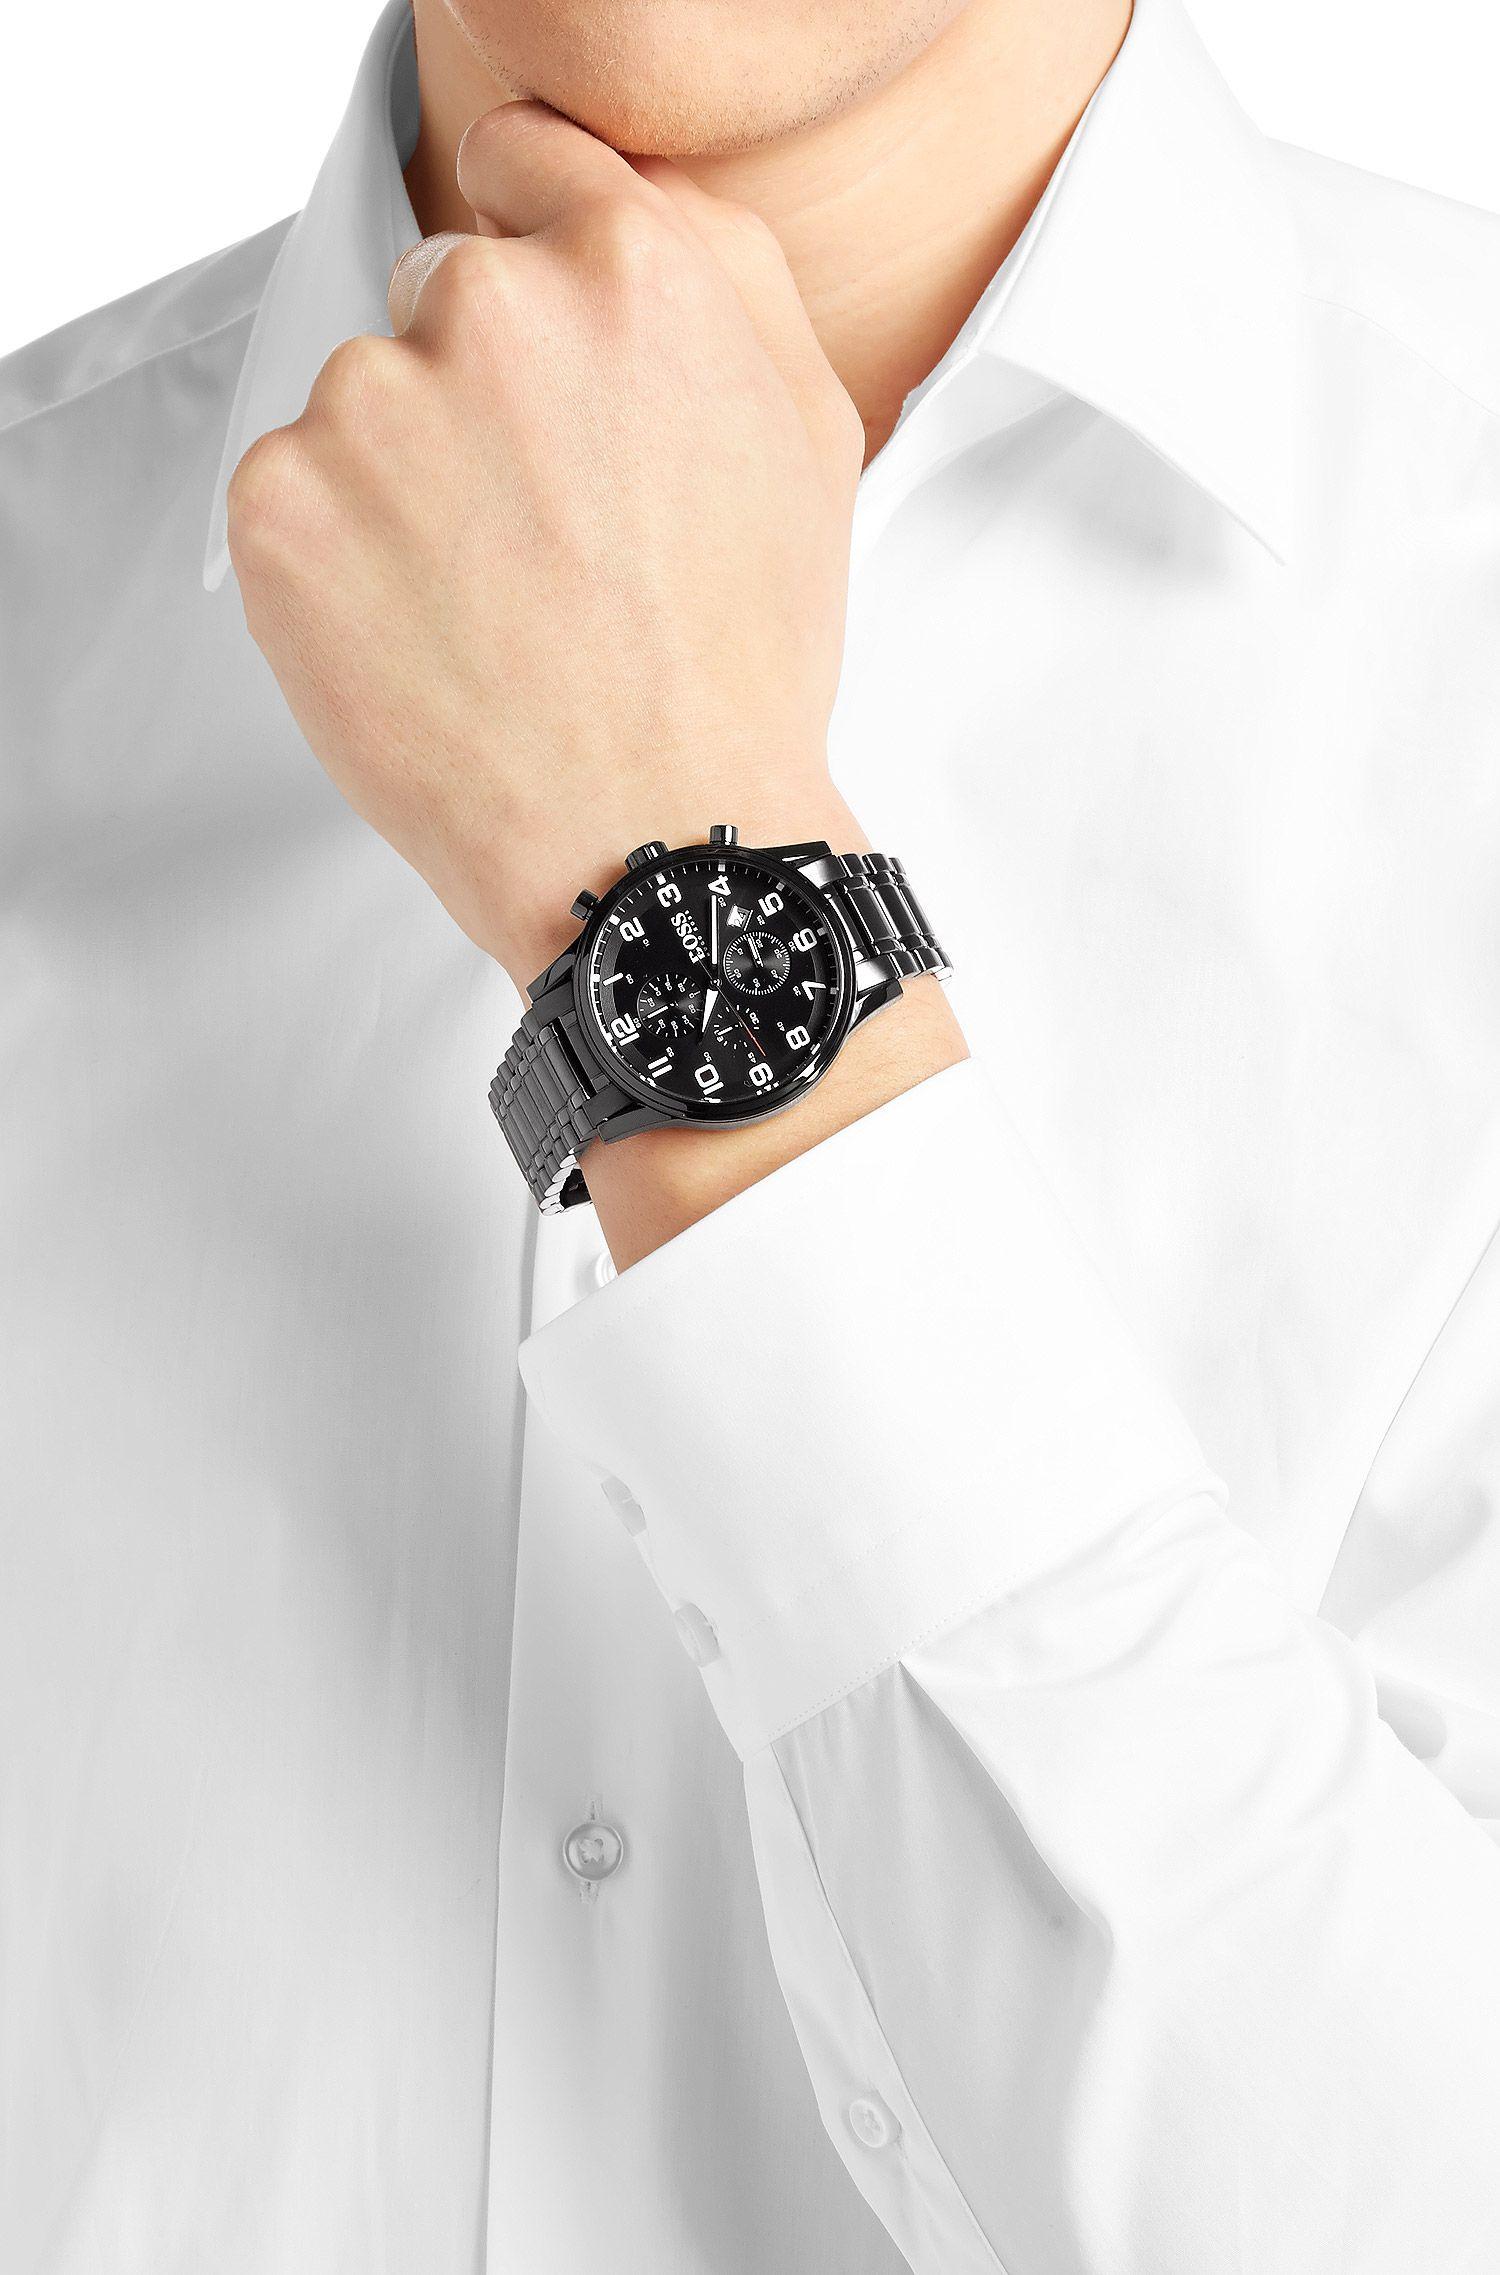 Chronographe «HBAERIR» avec boîtier en acier inox noir